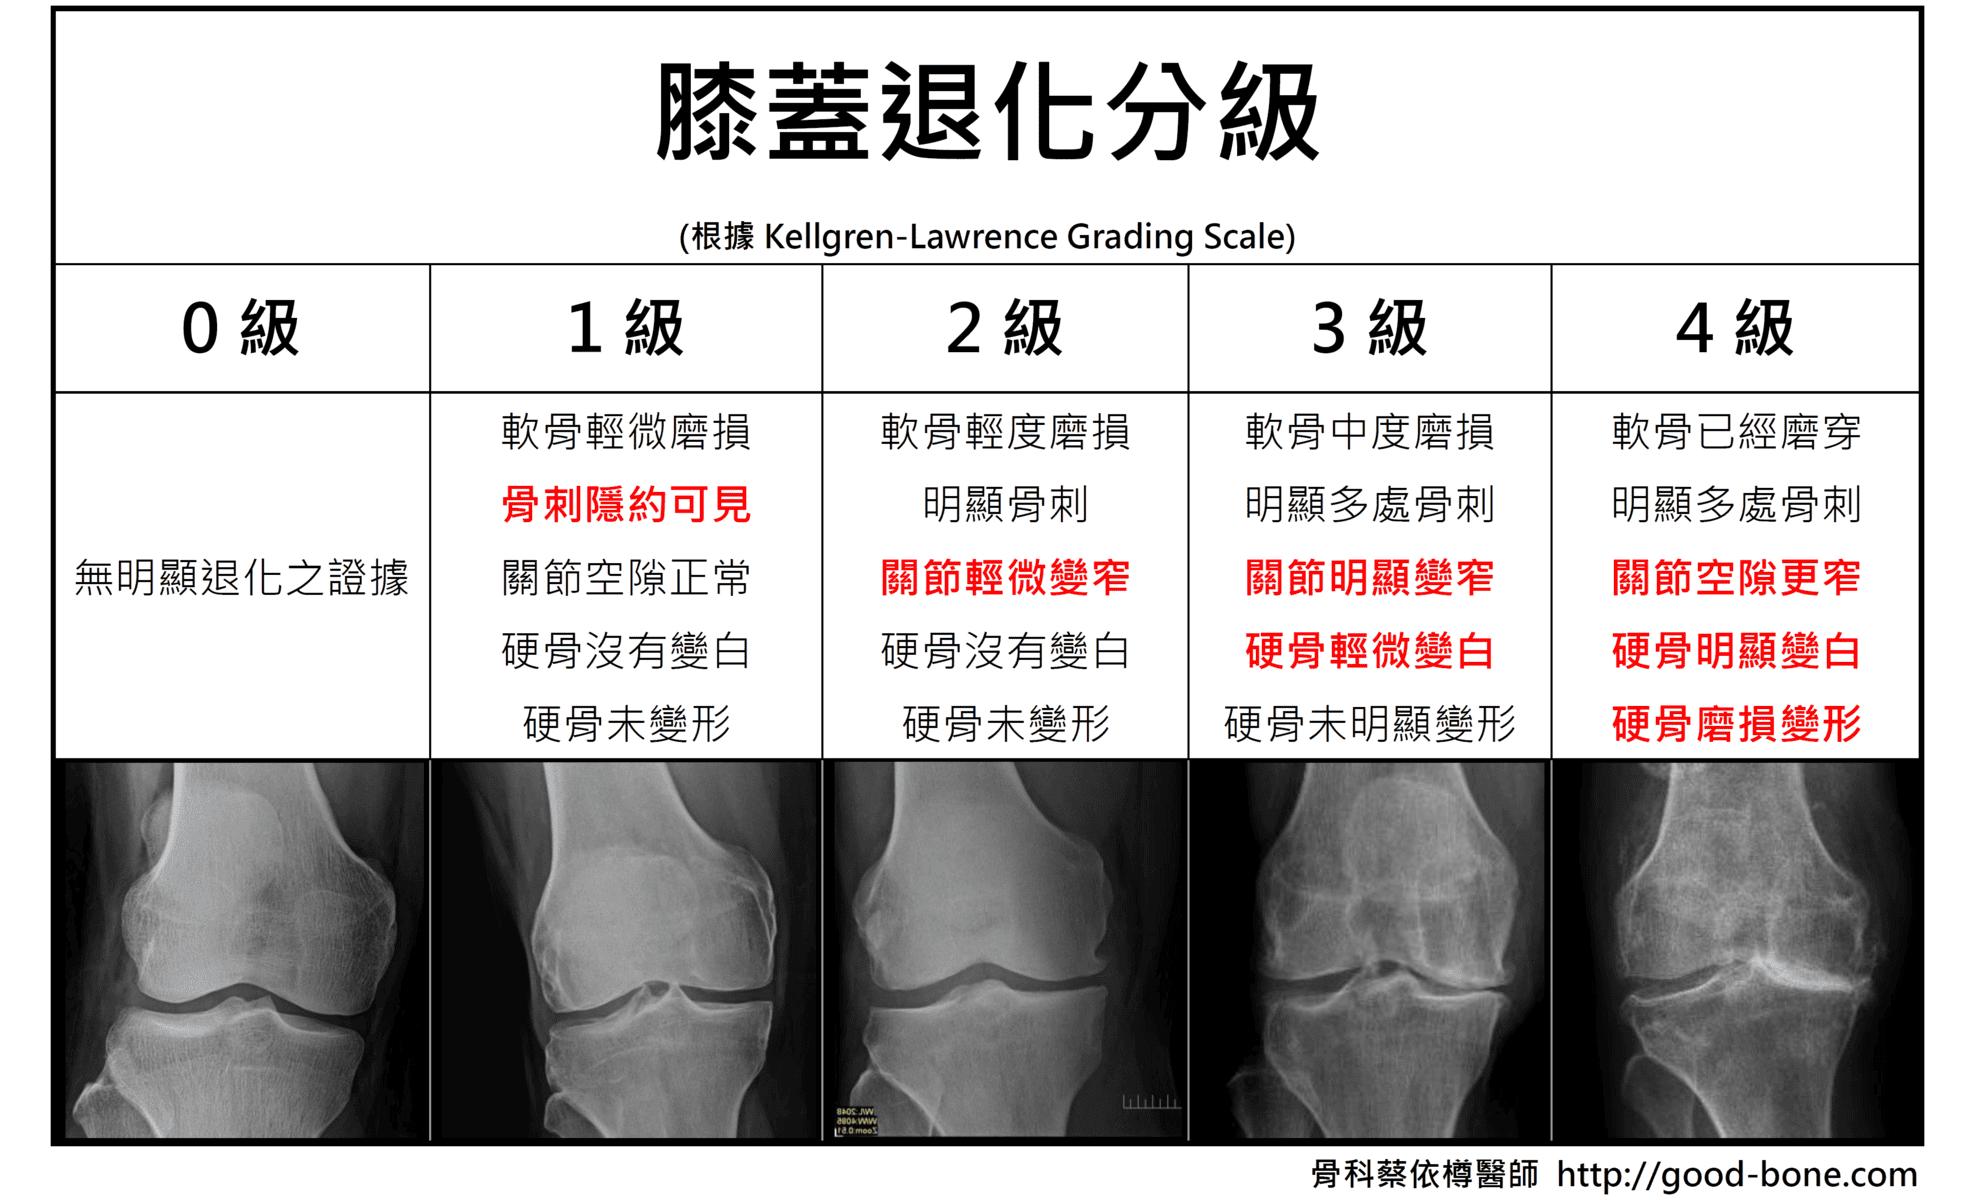 膝關節分級 Kellgren-Lawrence ; 骨科蔡依樽醫師 https://good-bone.com/